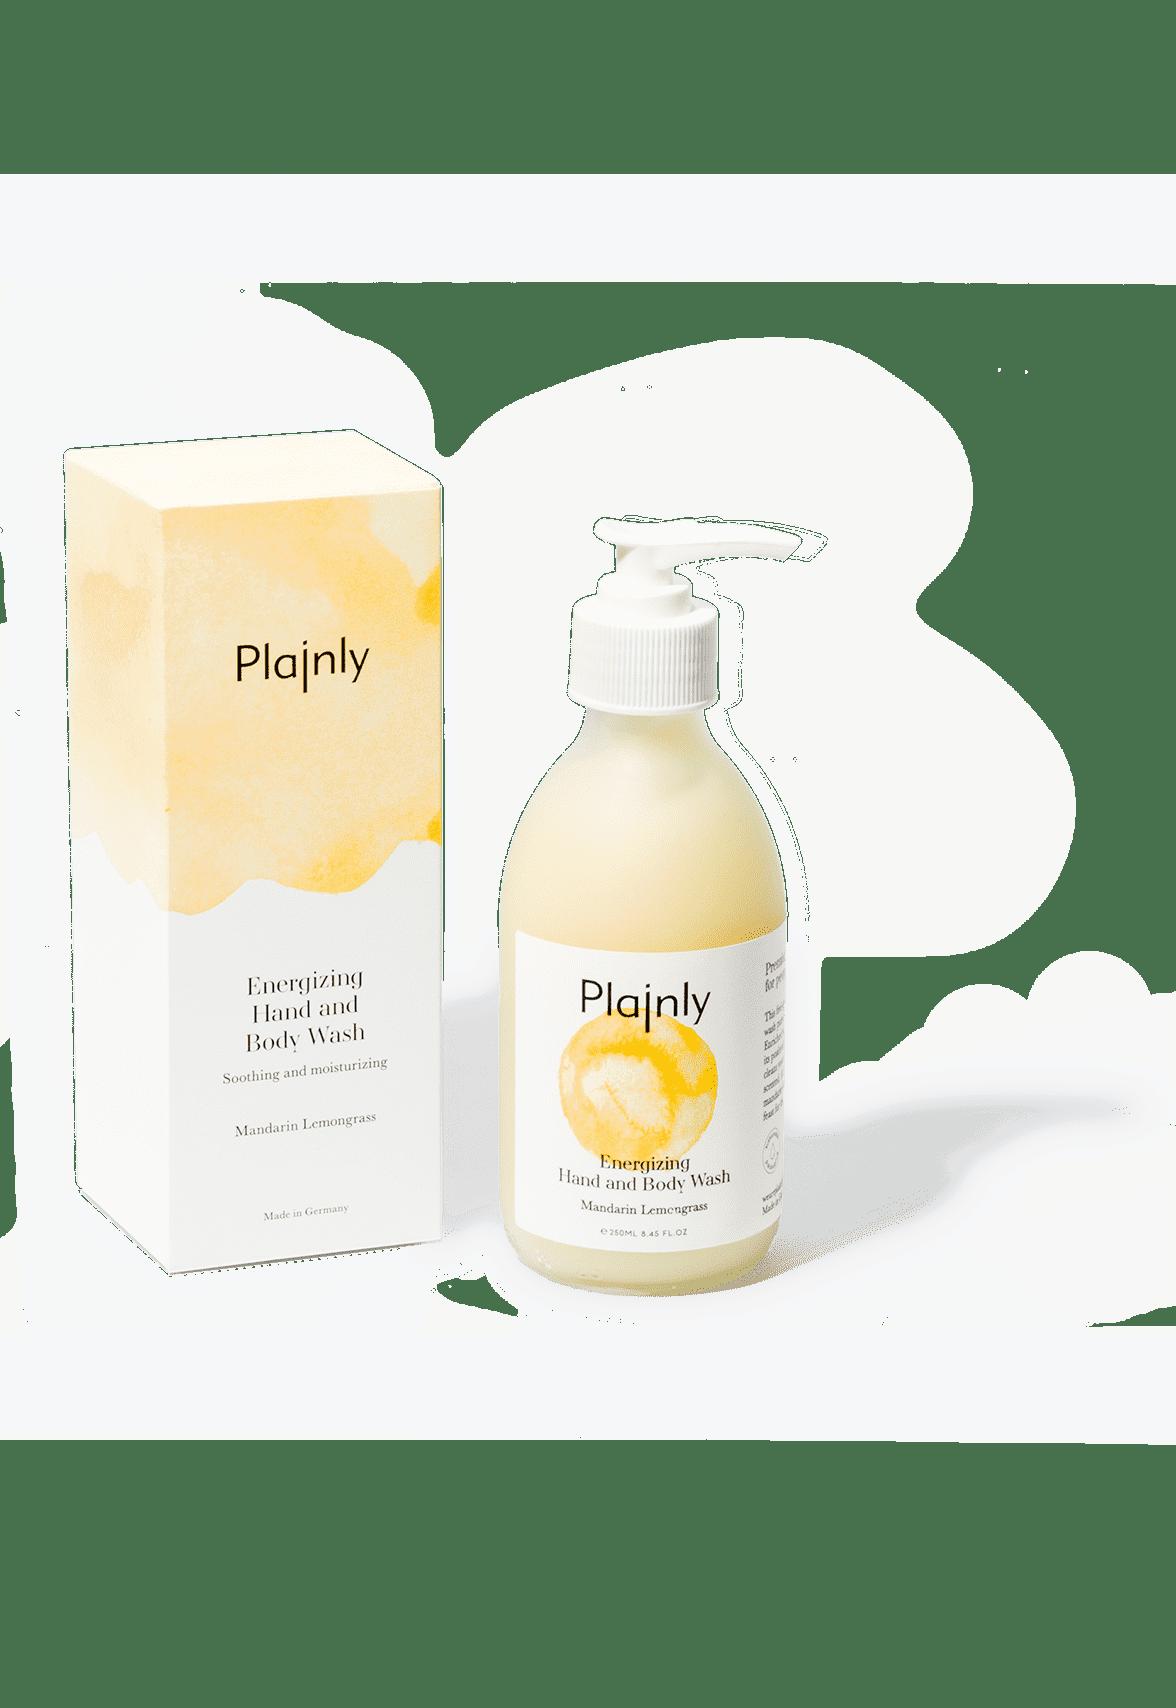 Energizing Hand and Body Wash mit Mandarin-Lemongrass Duft. 250ml.